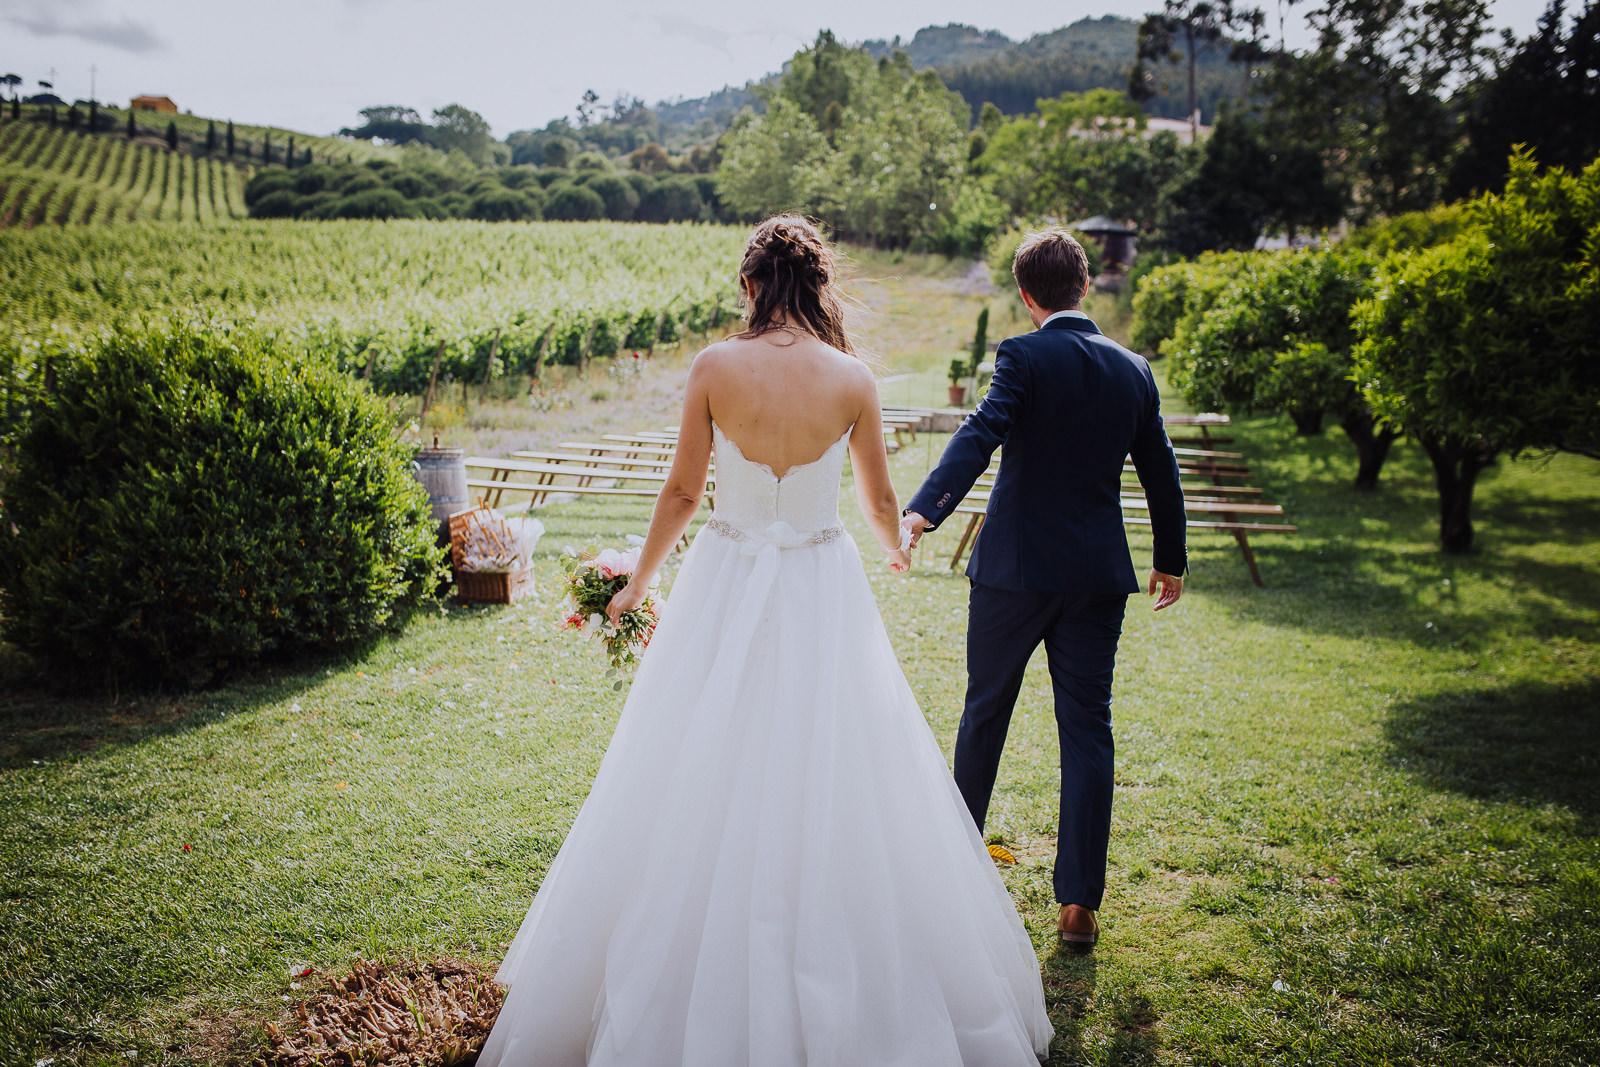 wedding_quinta_santana_mafra_portugal_051.jpg